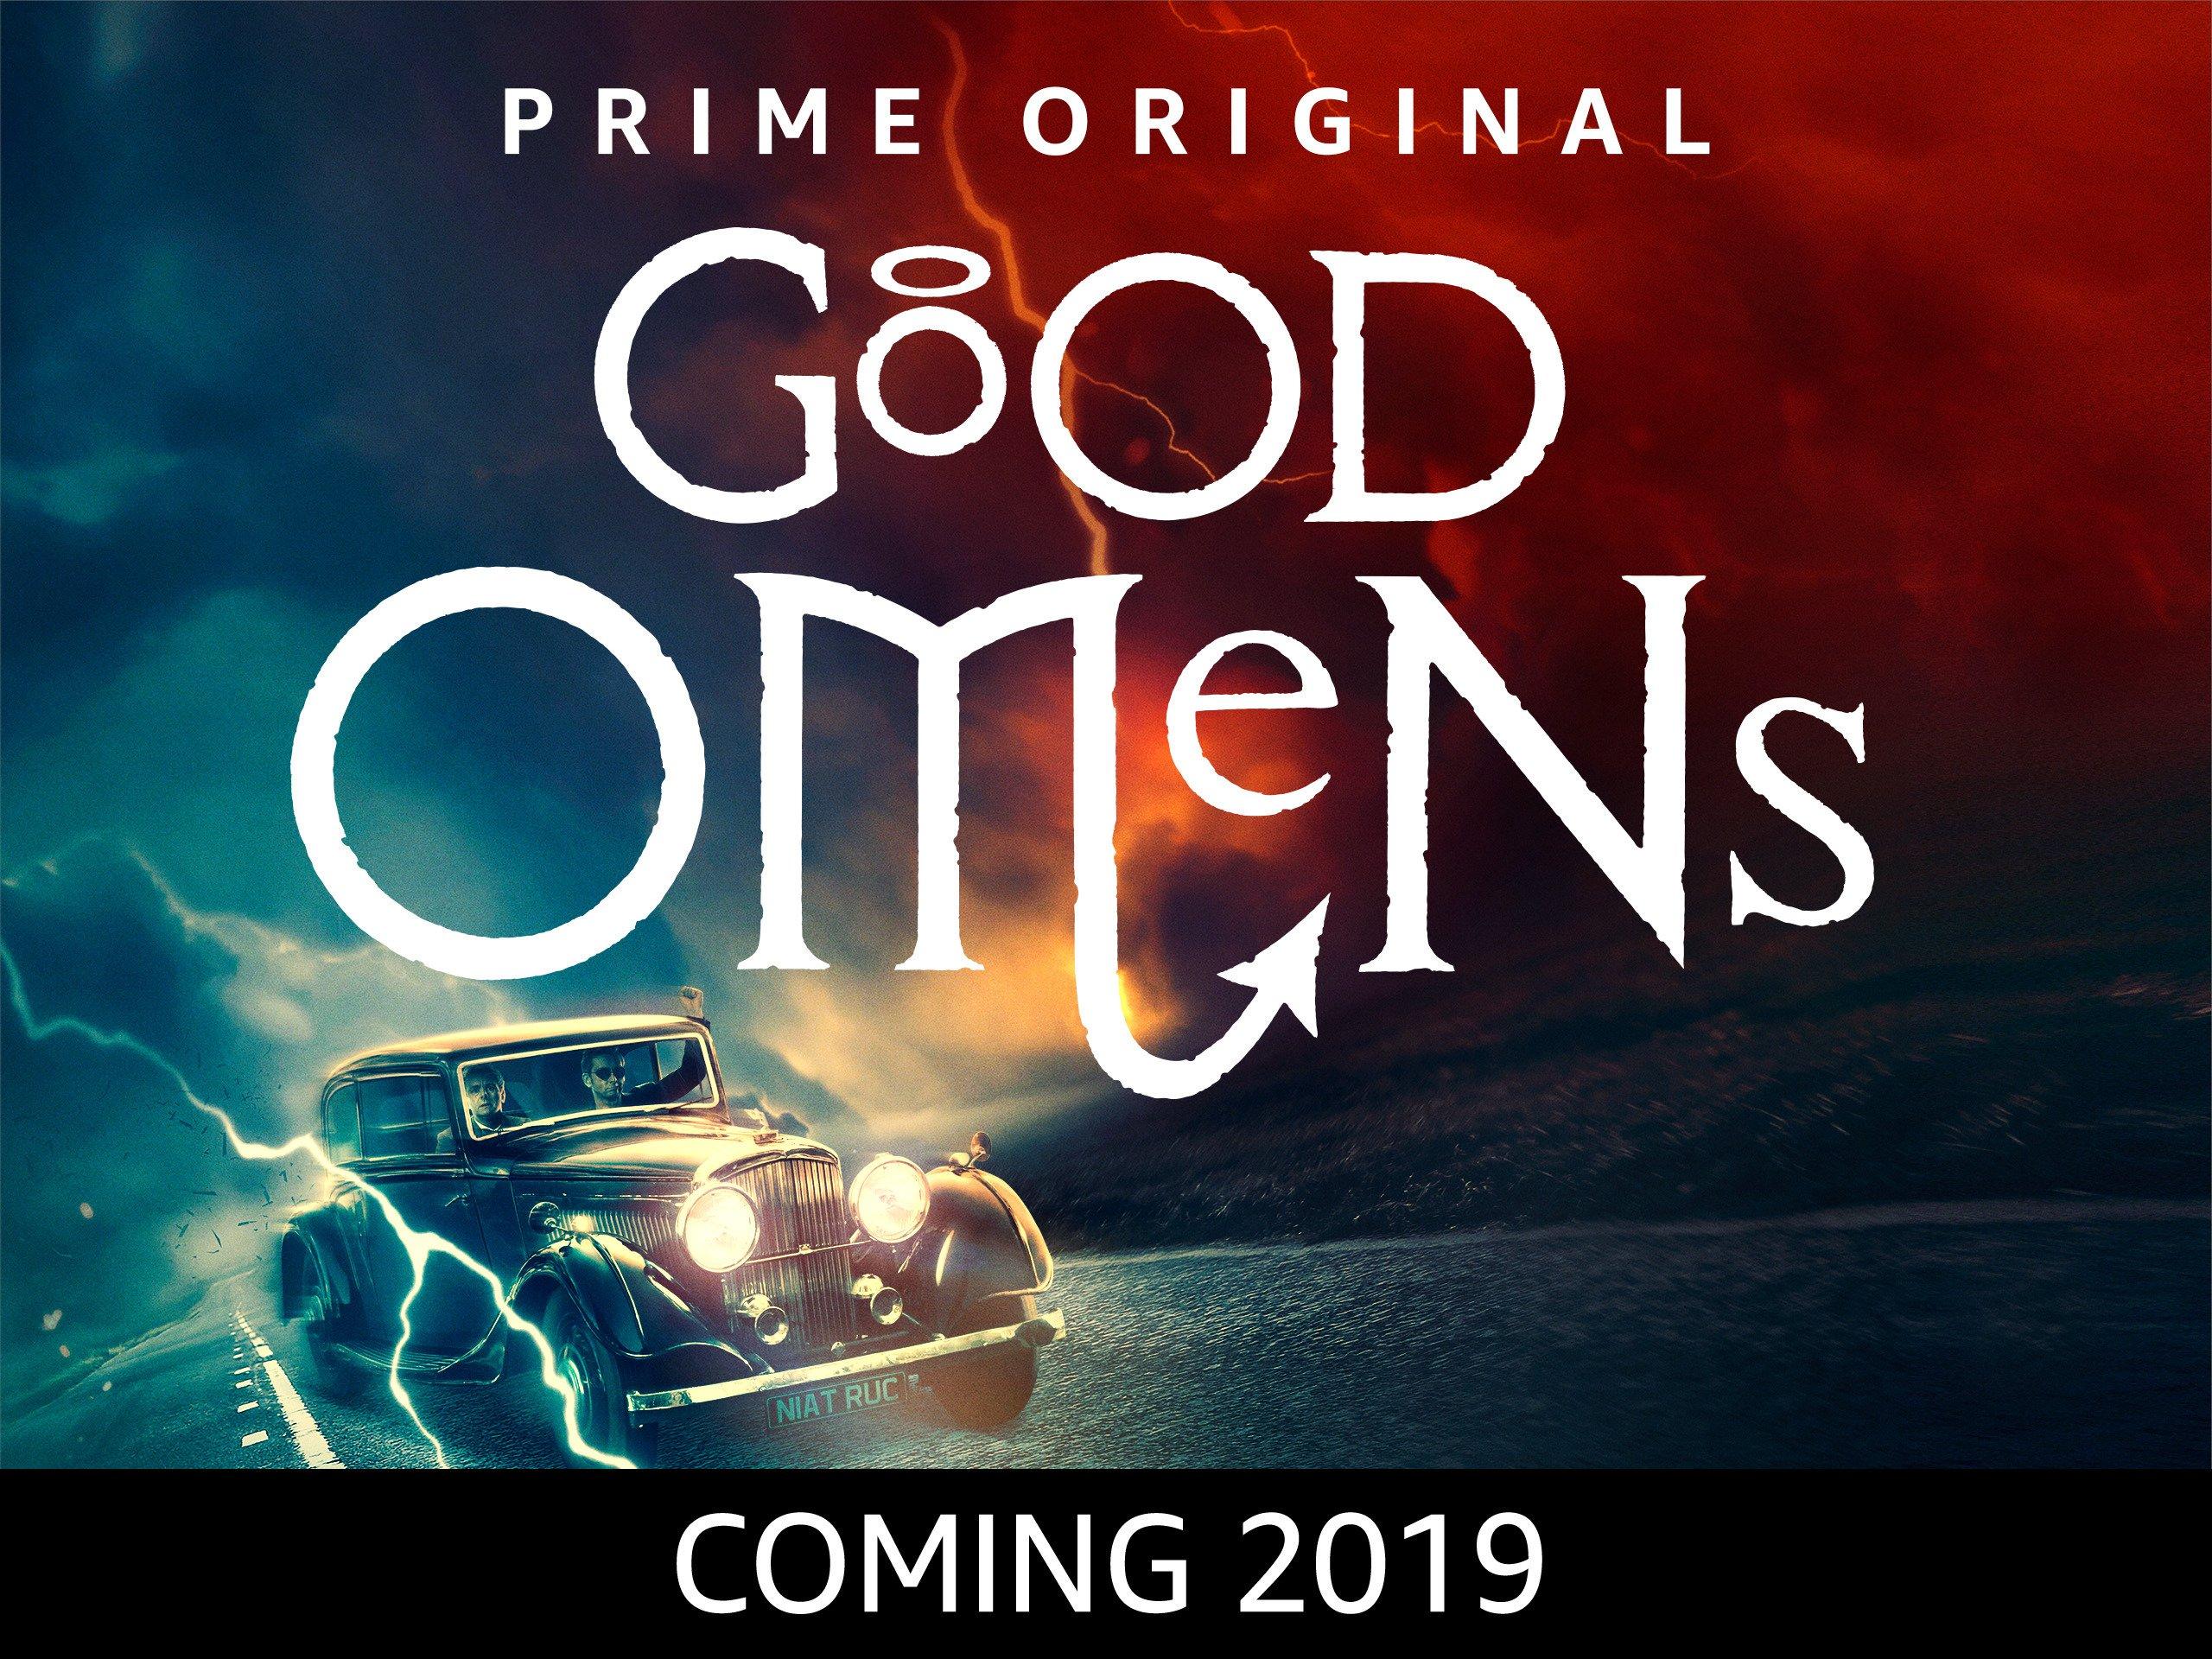 bollywood movie list on amazon prime